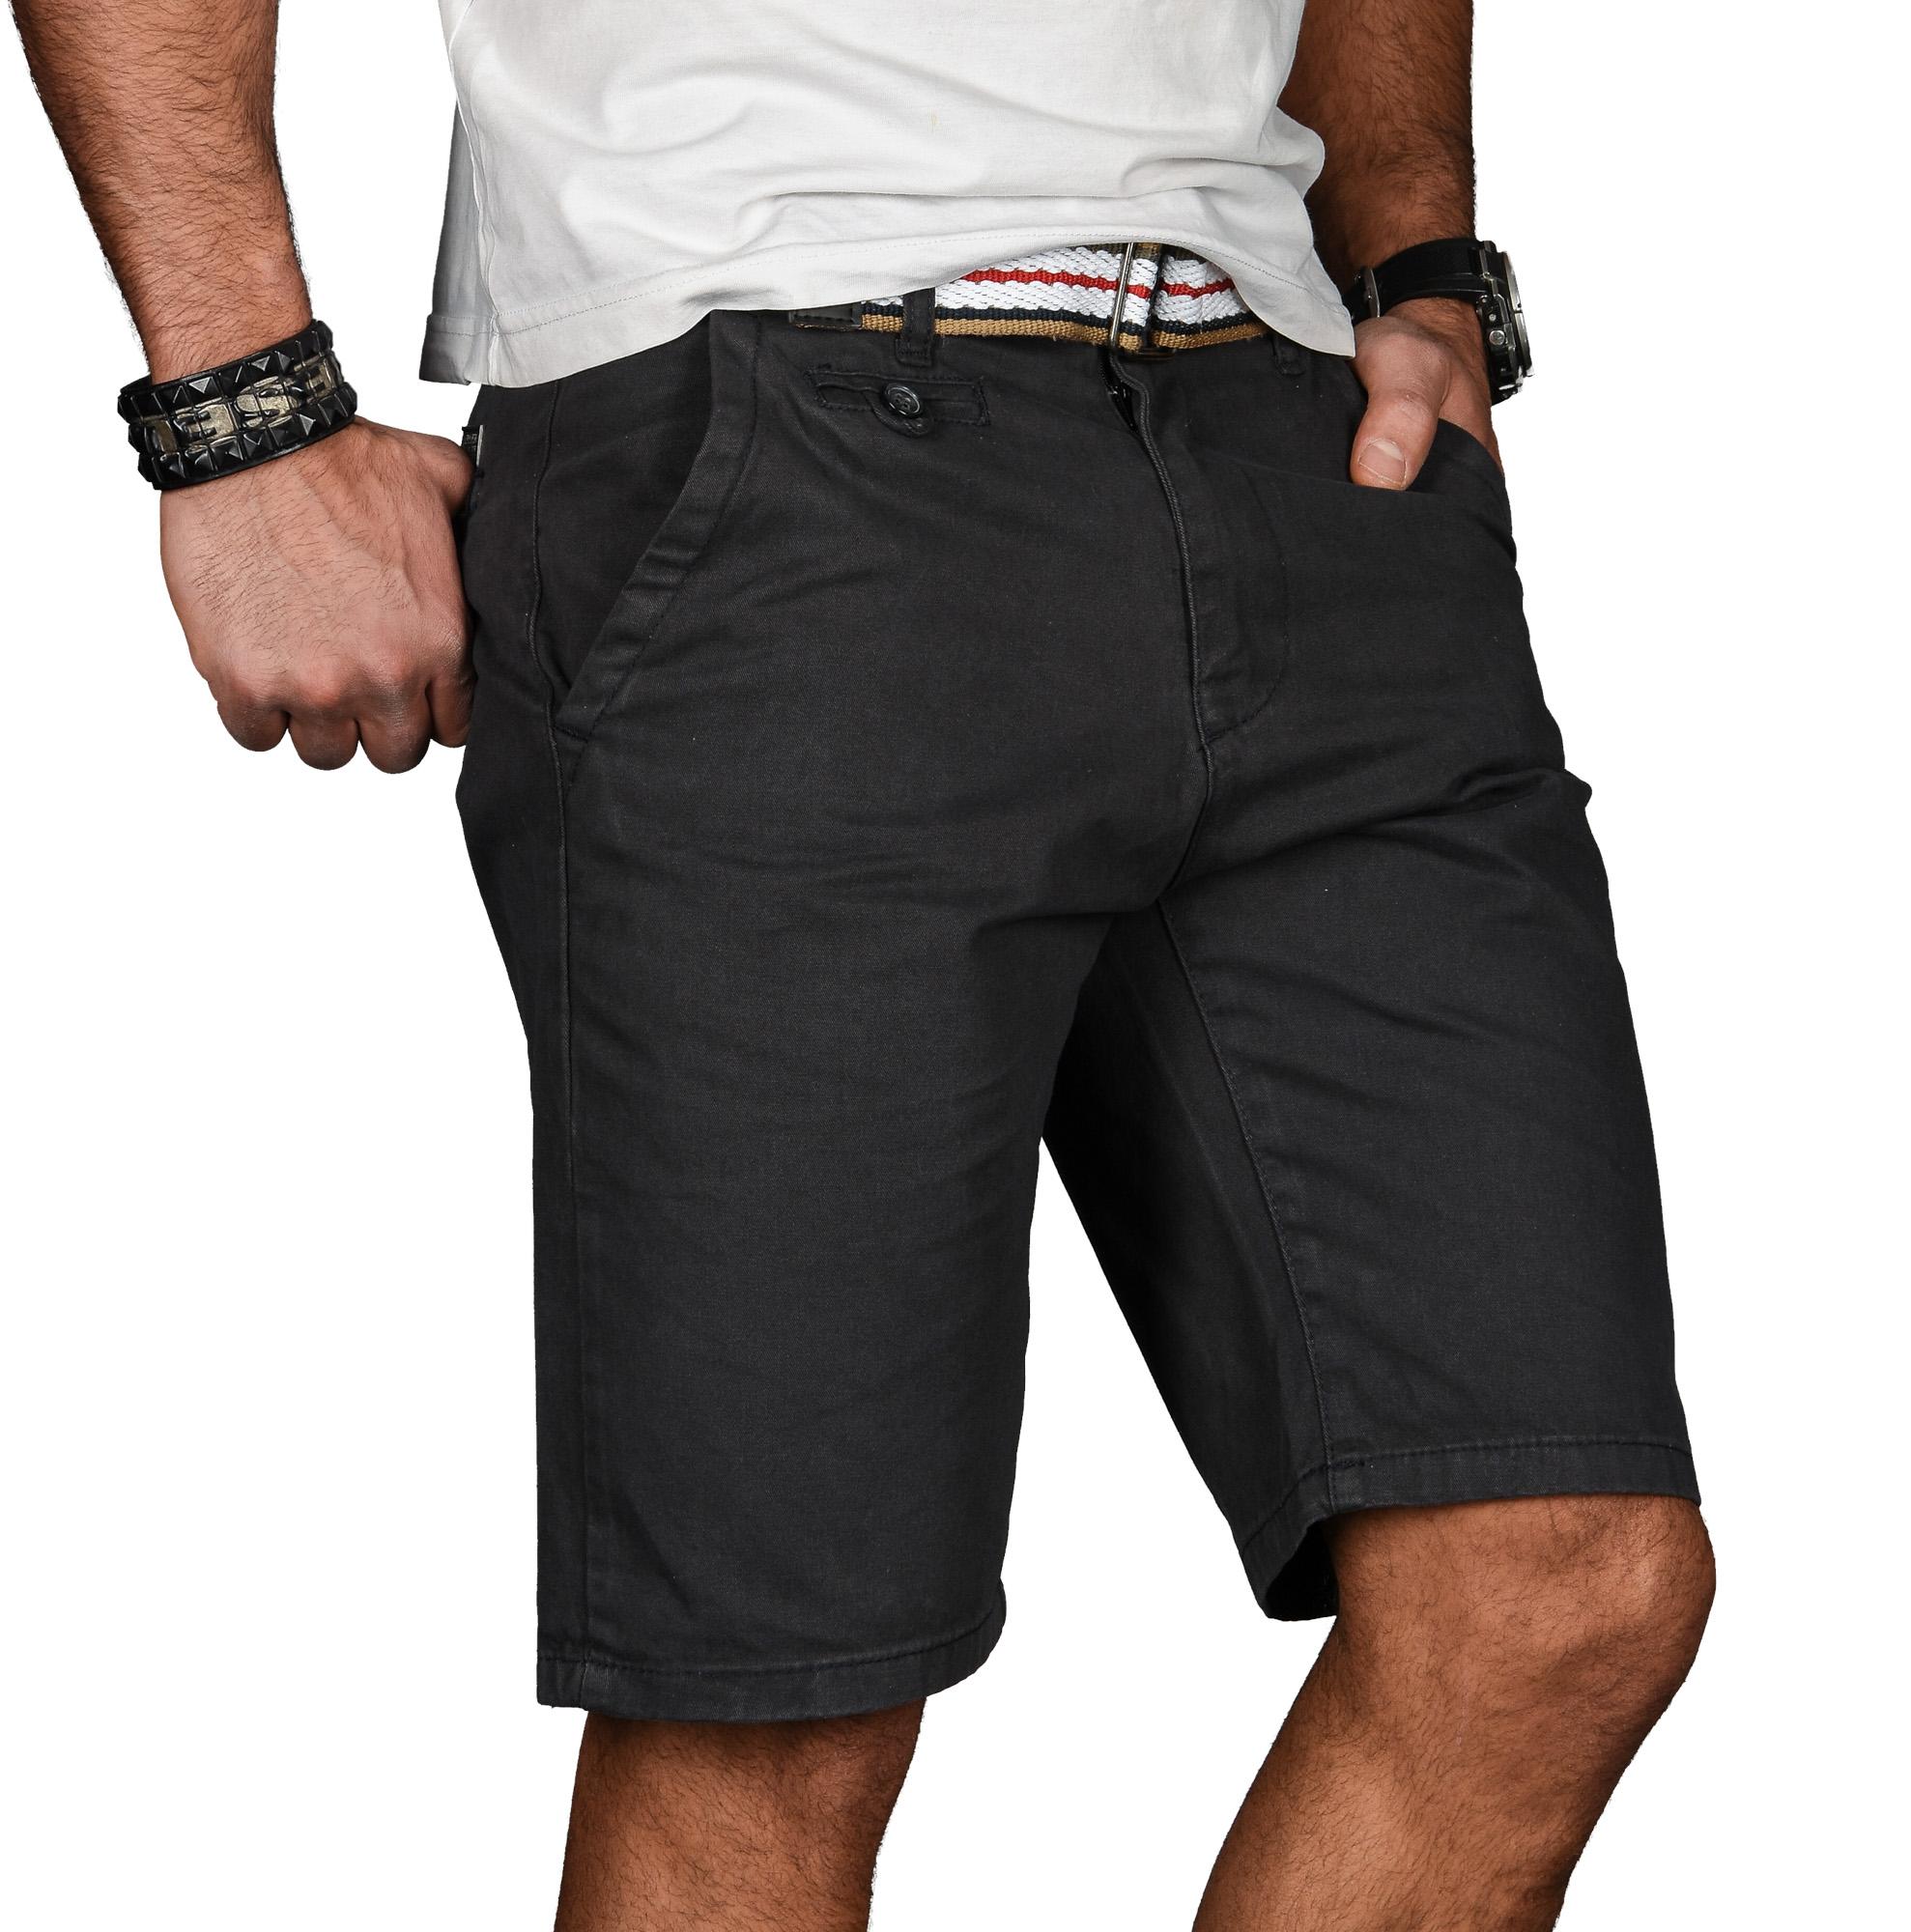 A-Salvarini-Herren-Shorts-kurze-Sommer-Hose-mit-Guertel-Short-Bermuda-NEU-AS096 Indexbild 17